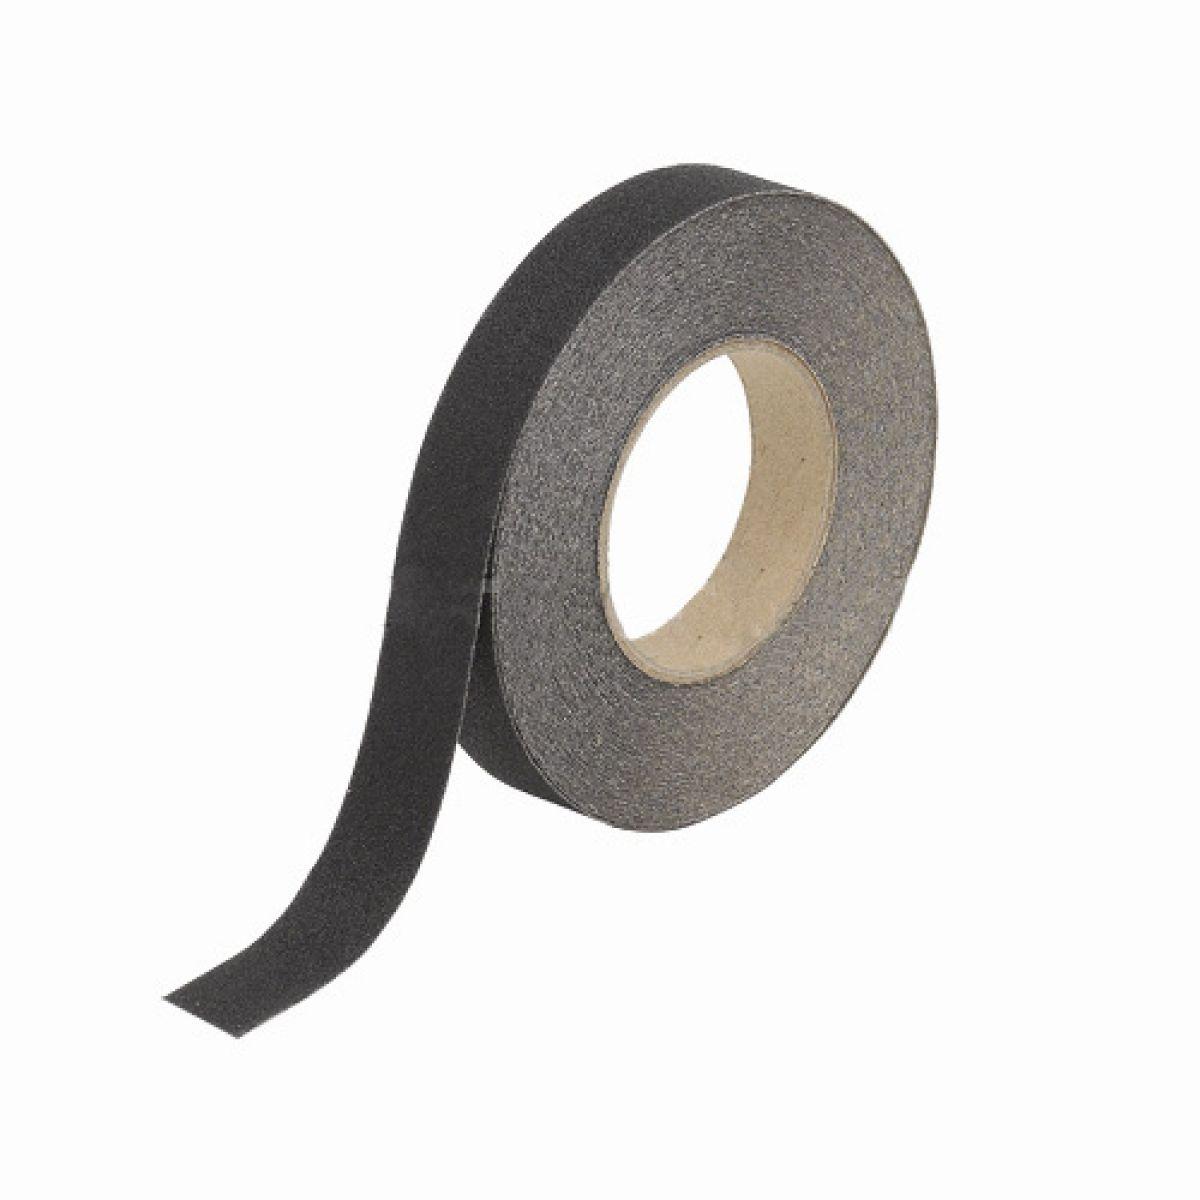 Лента противоскользящая черная 25 мм*18,3 м